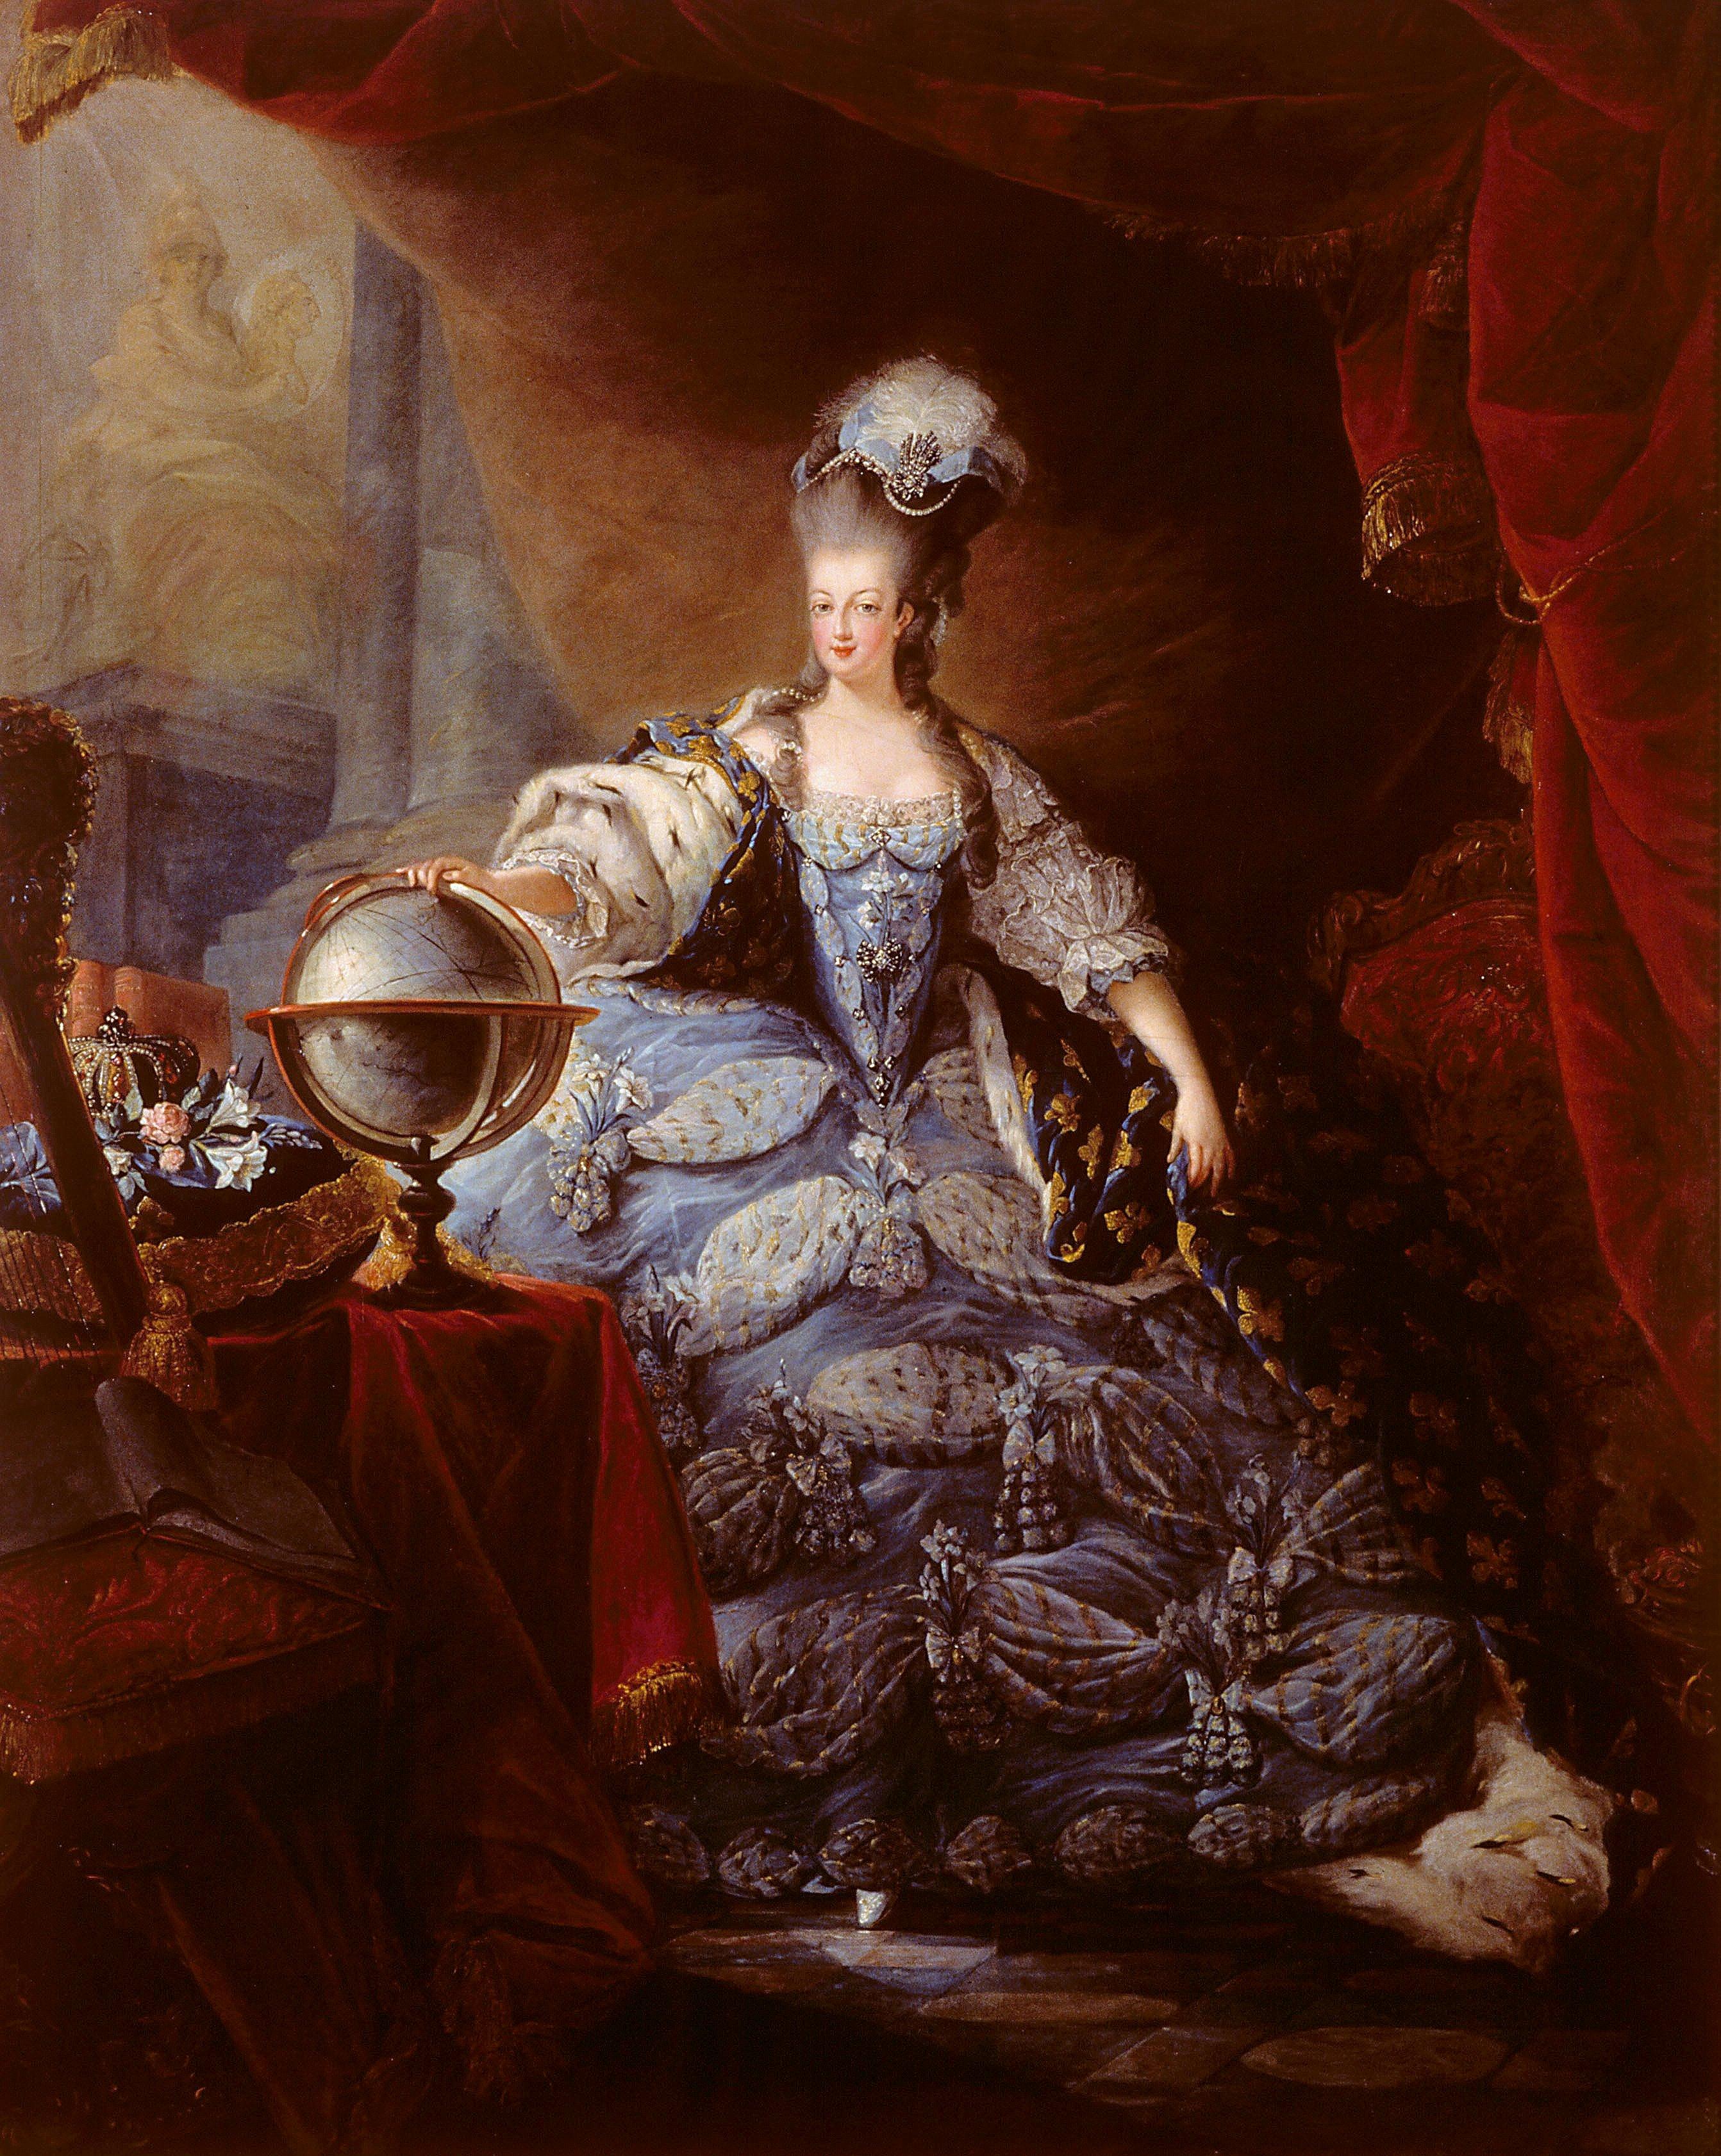 File:Gautier Dagoty_ _Marie Antoinette,_1775 on Italian Rococo Style Painting